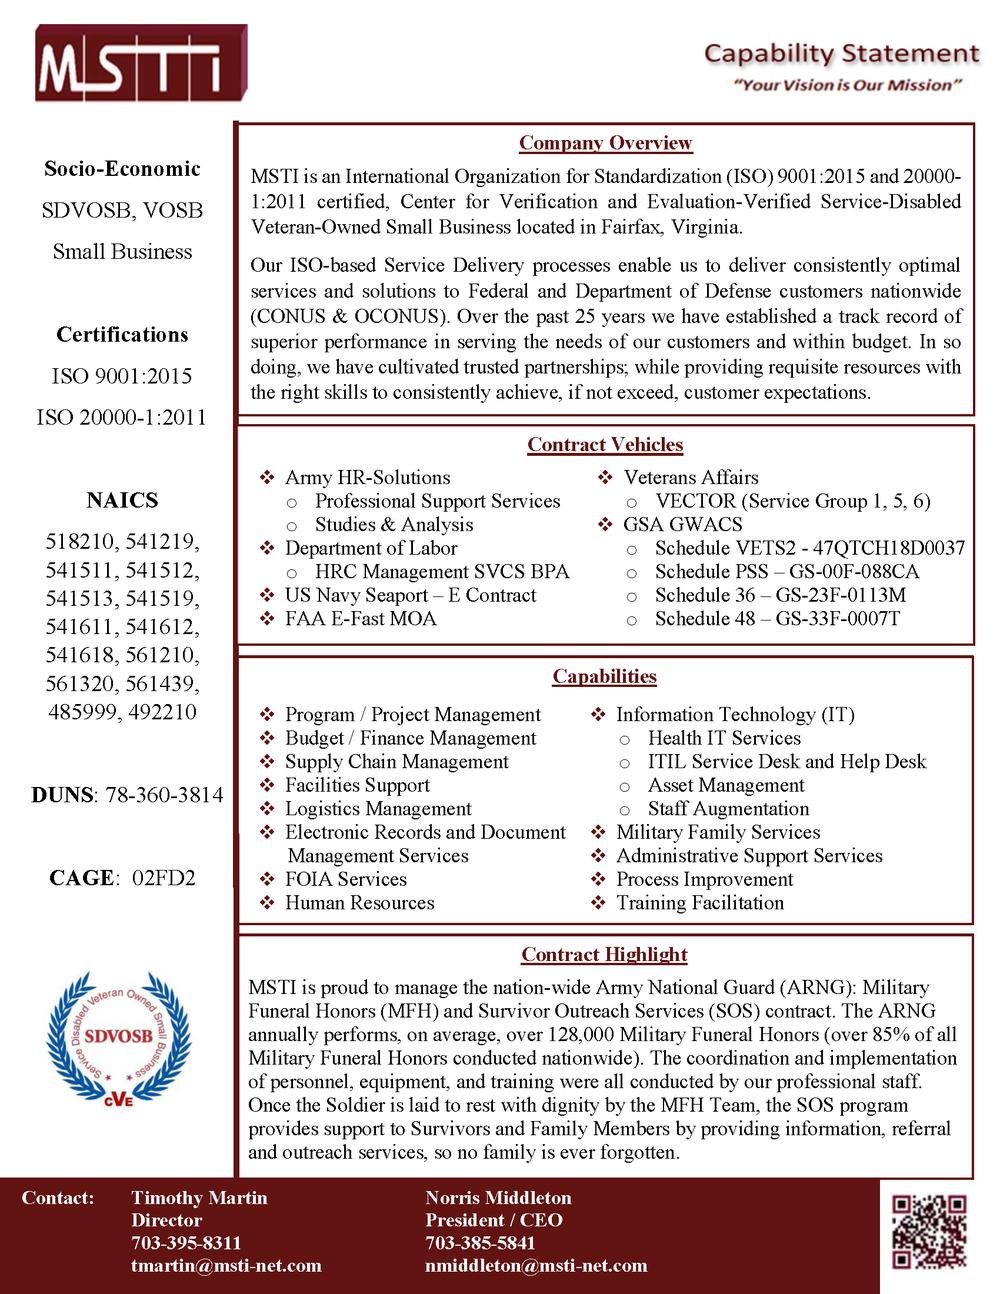 MSTI_Capability Profile_Aug 2018.png